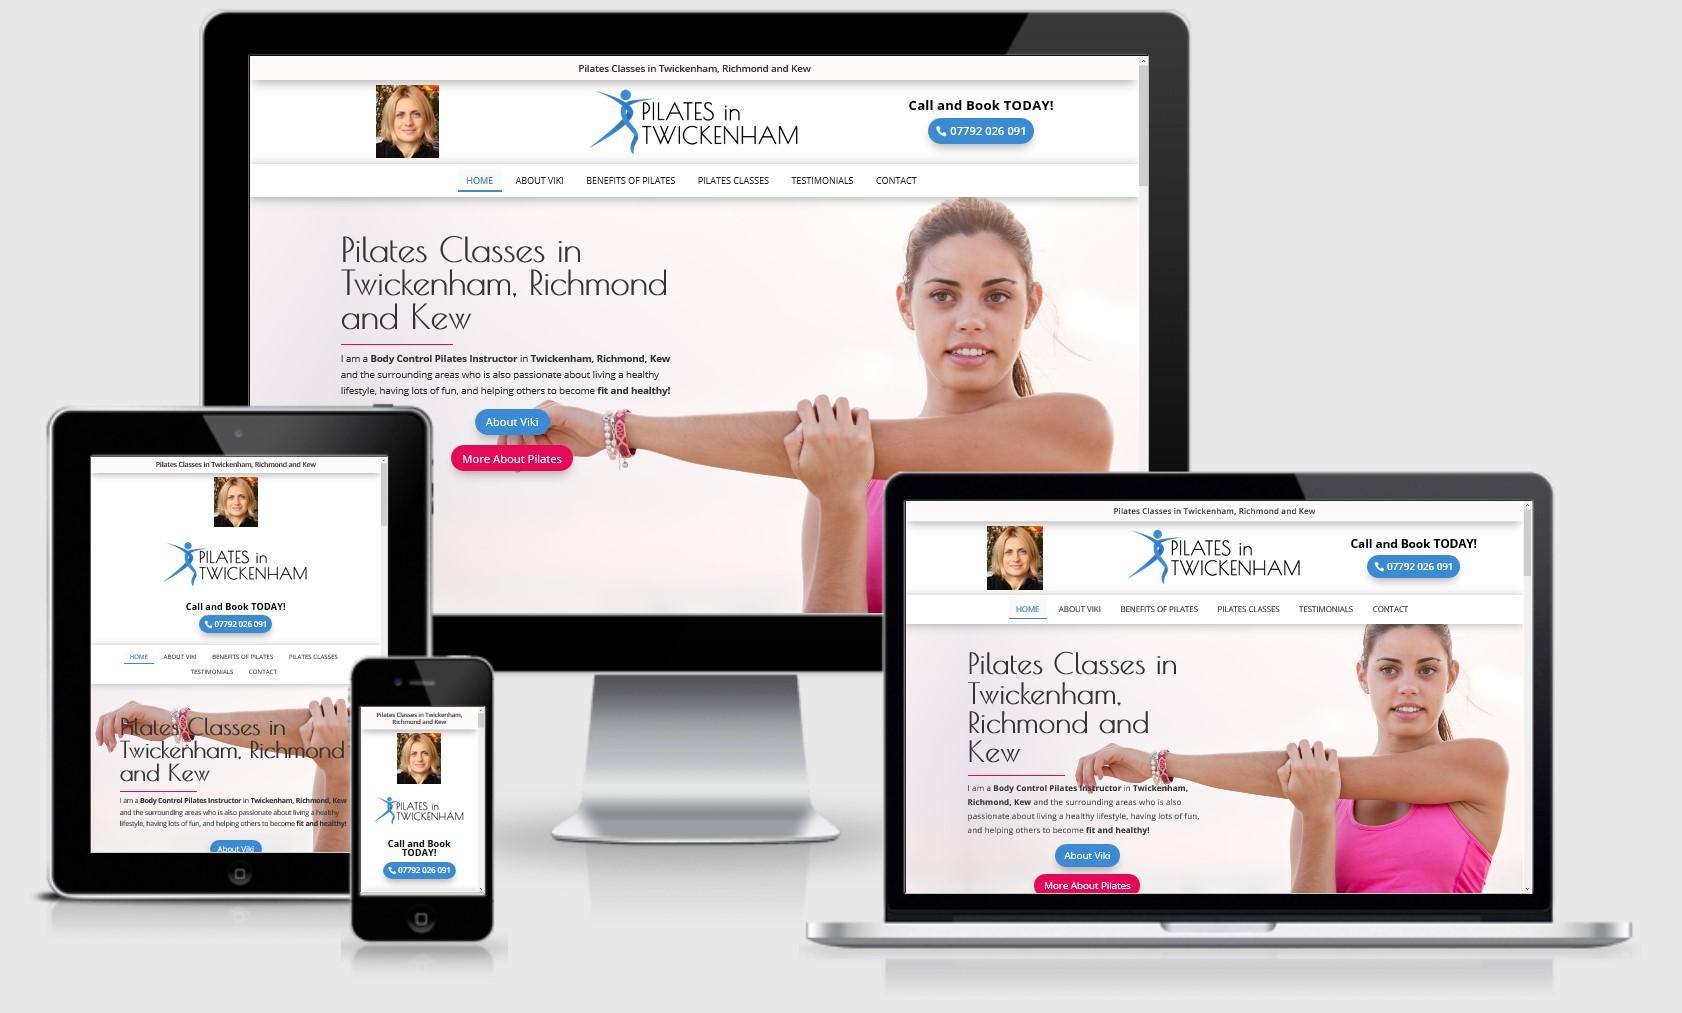 Pilates in Twickenham Website